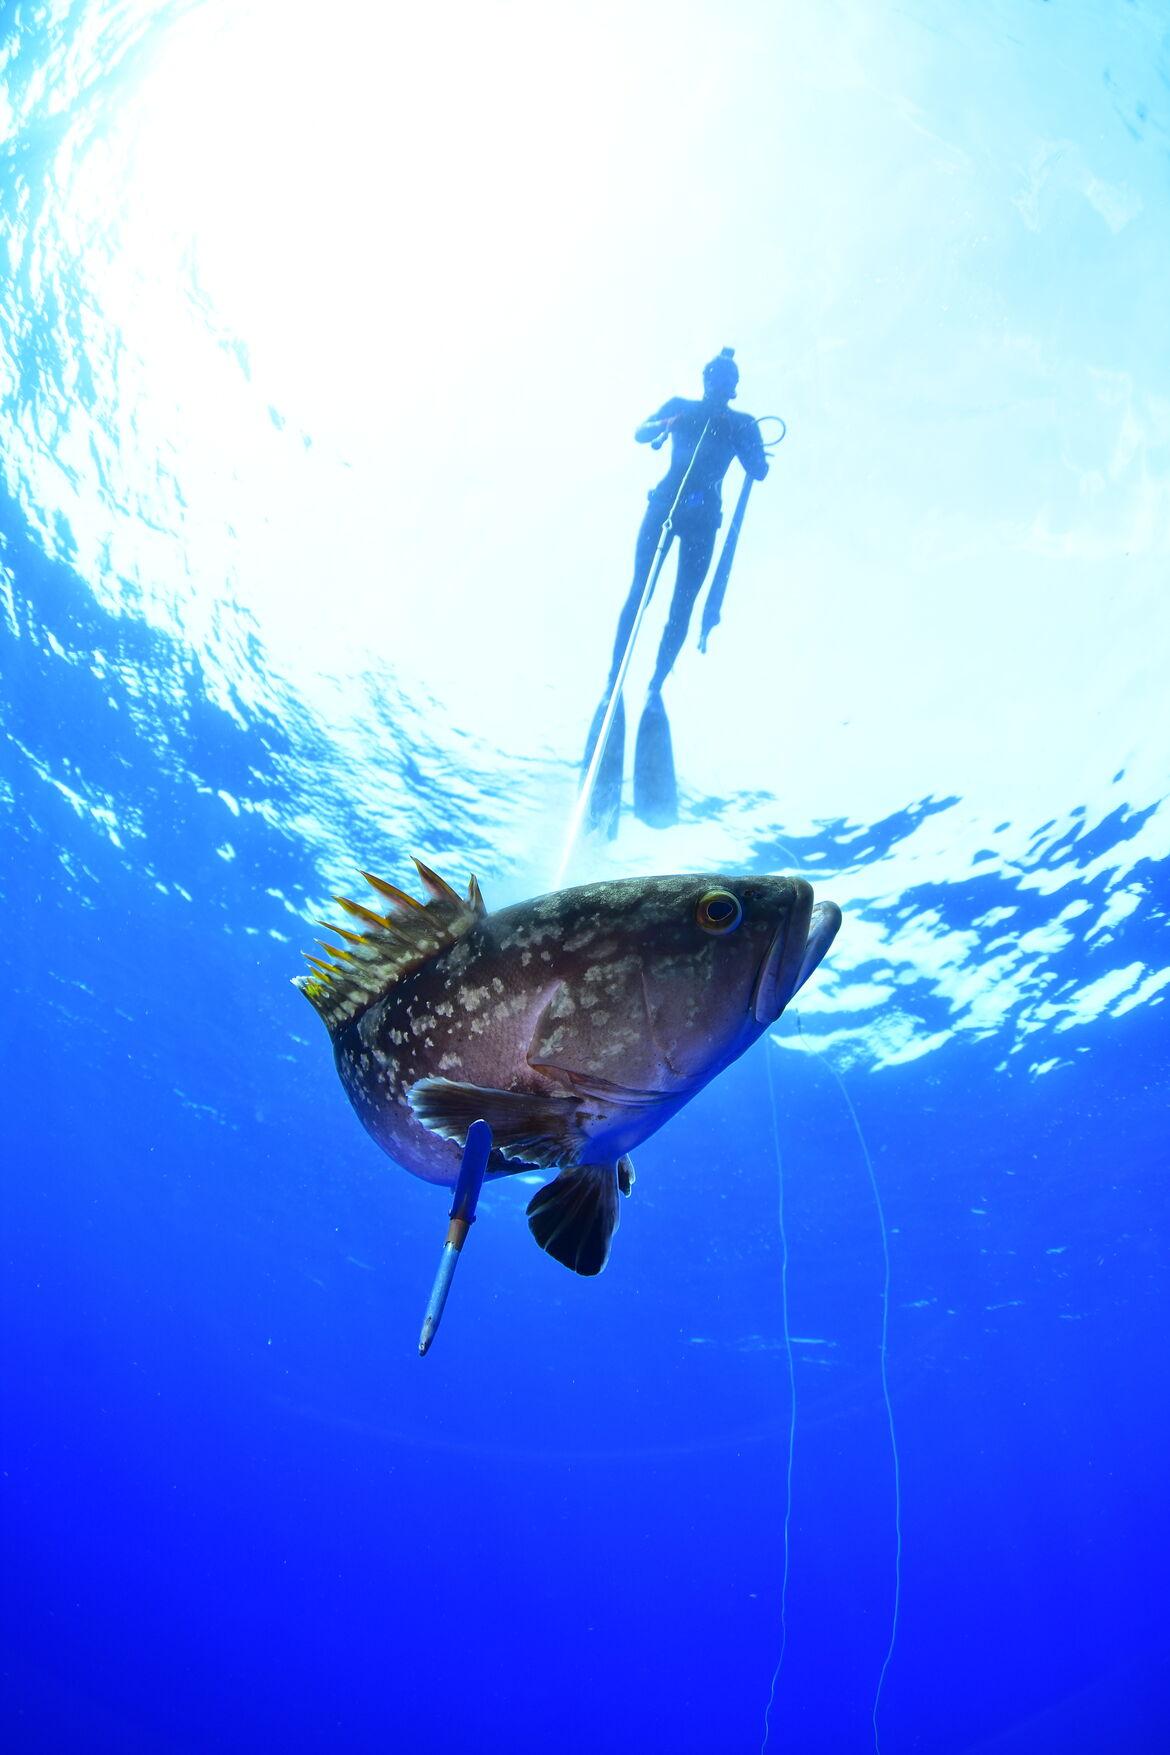 Mero capturado en aguas canarias